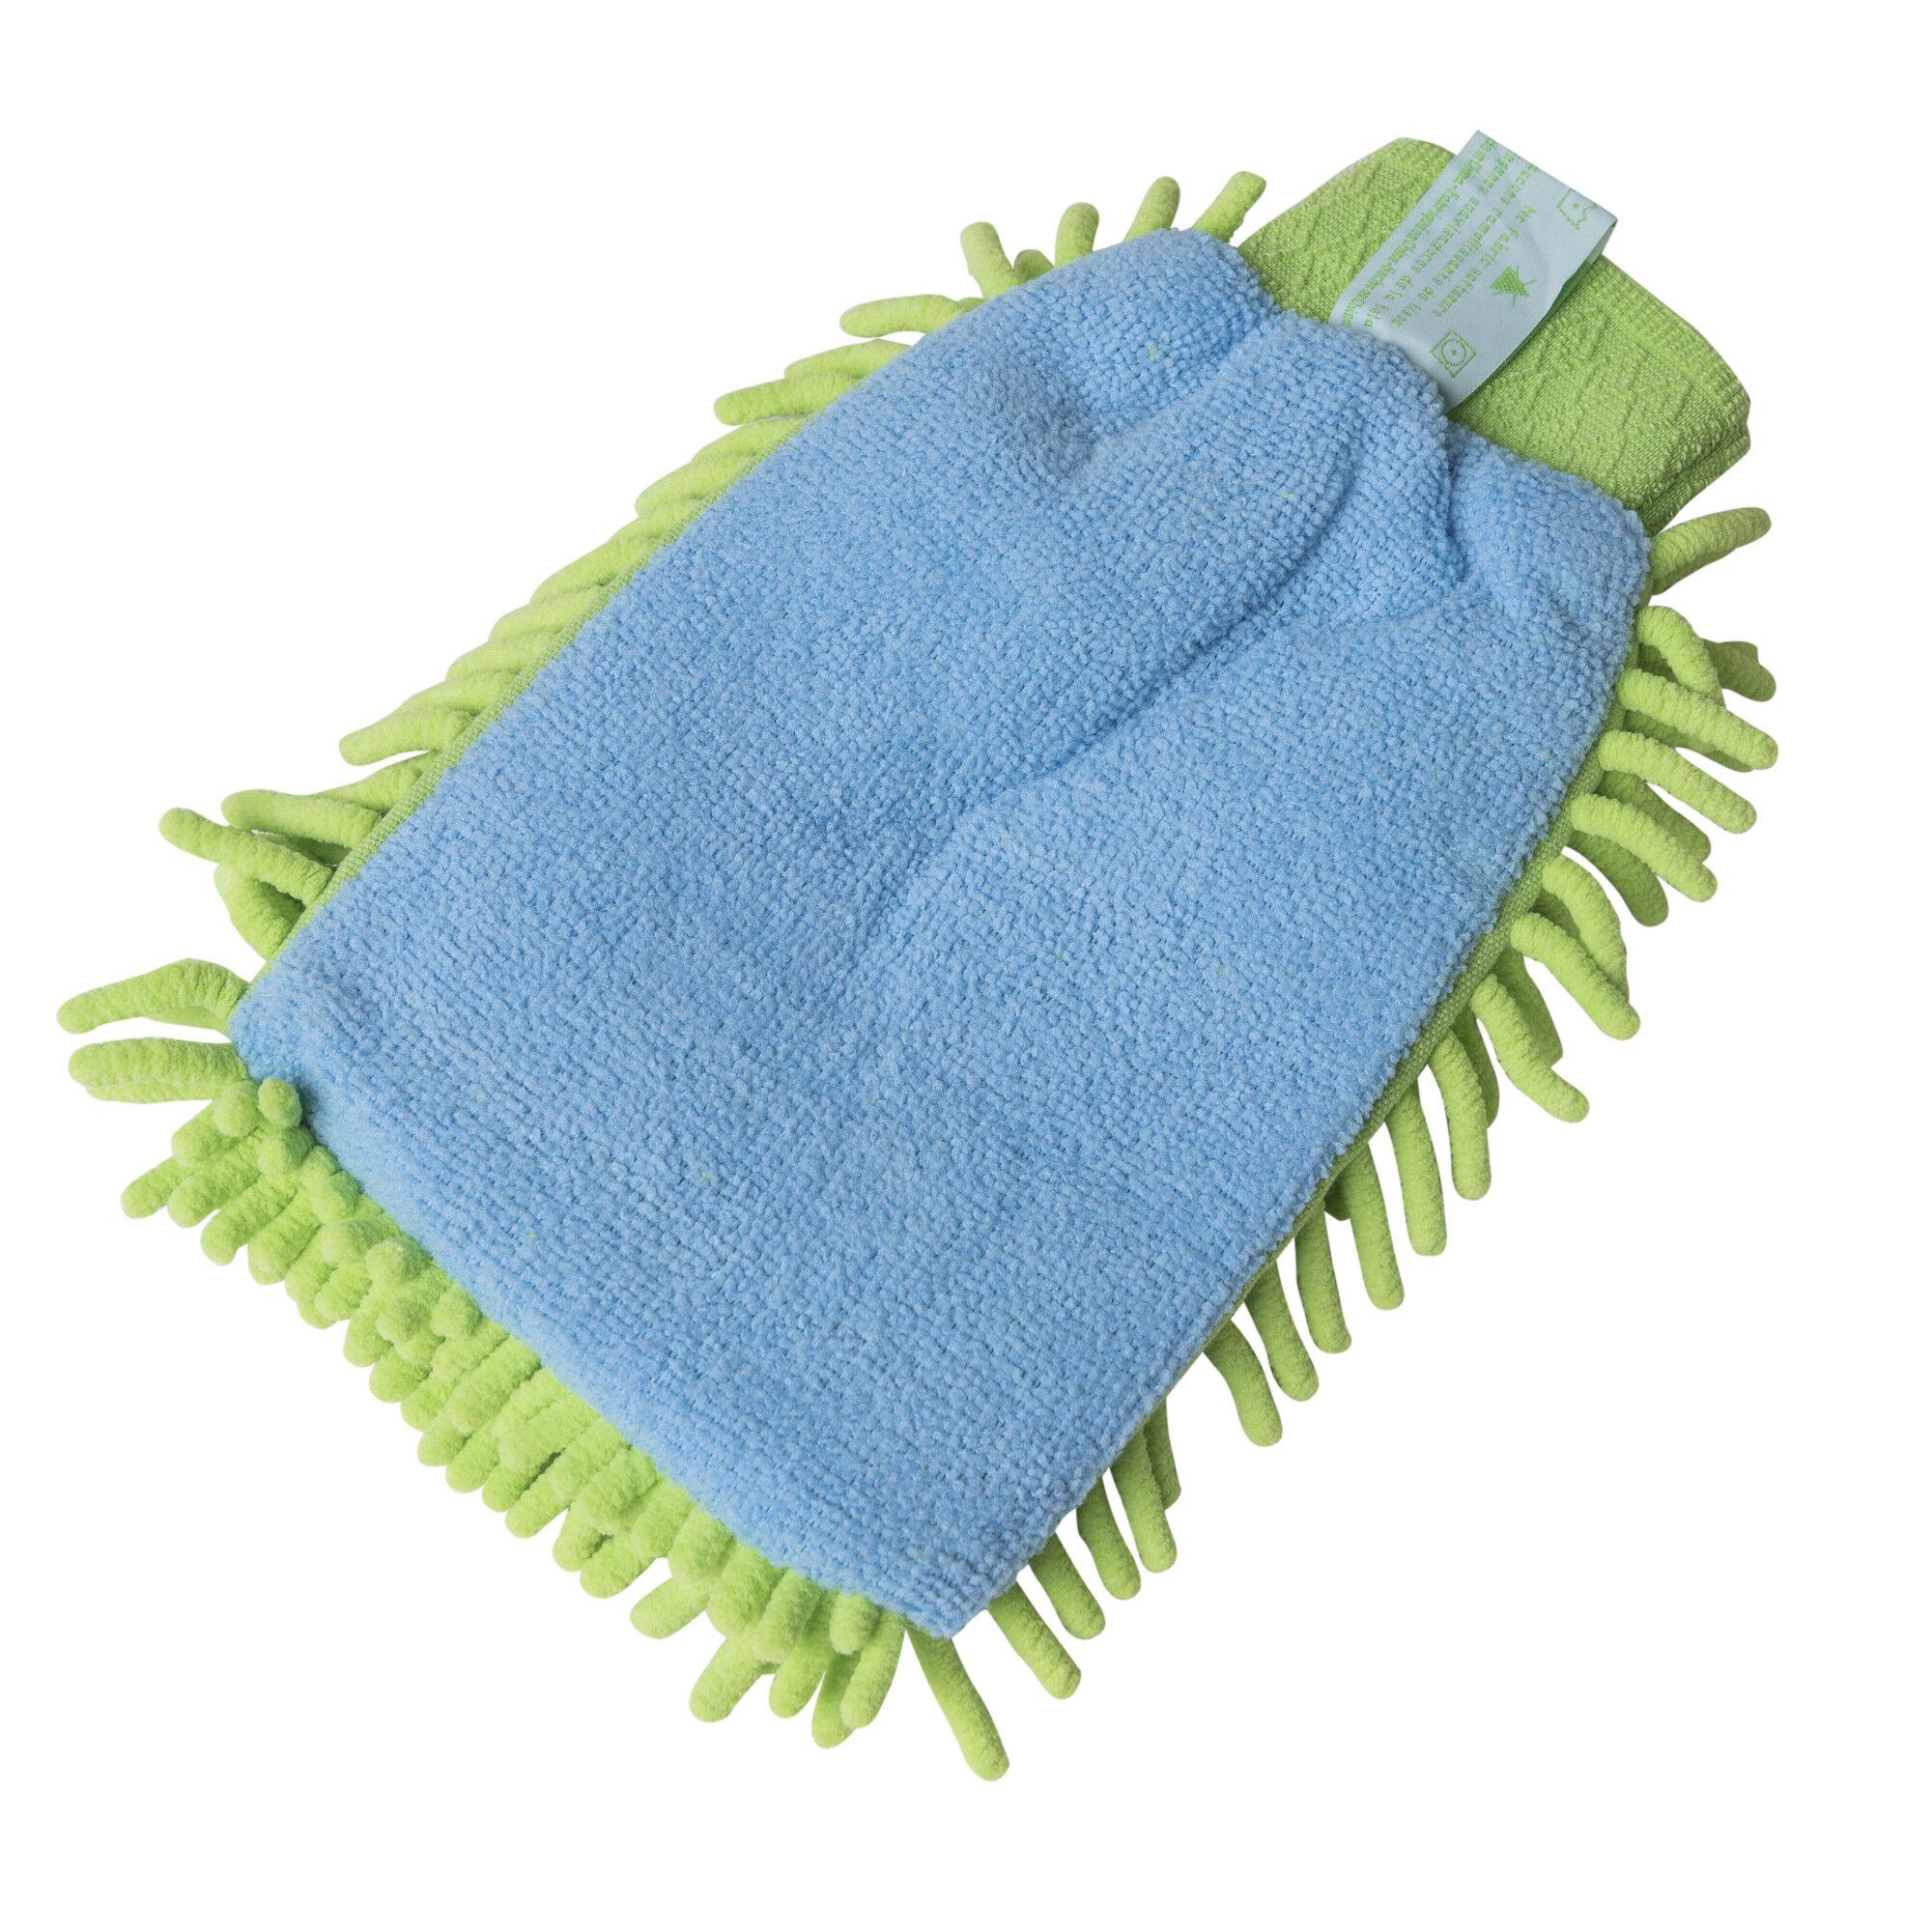 Microfiber Cloth Dusting: Microfiber Chenille Dusting